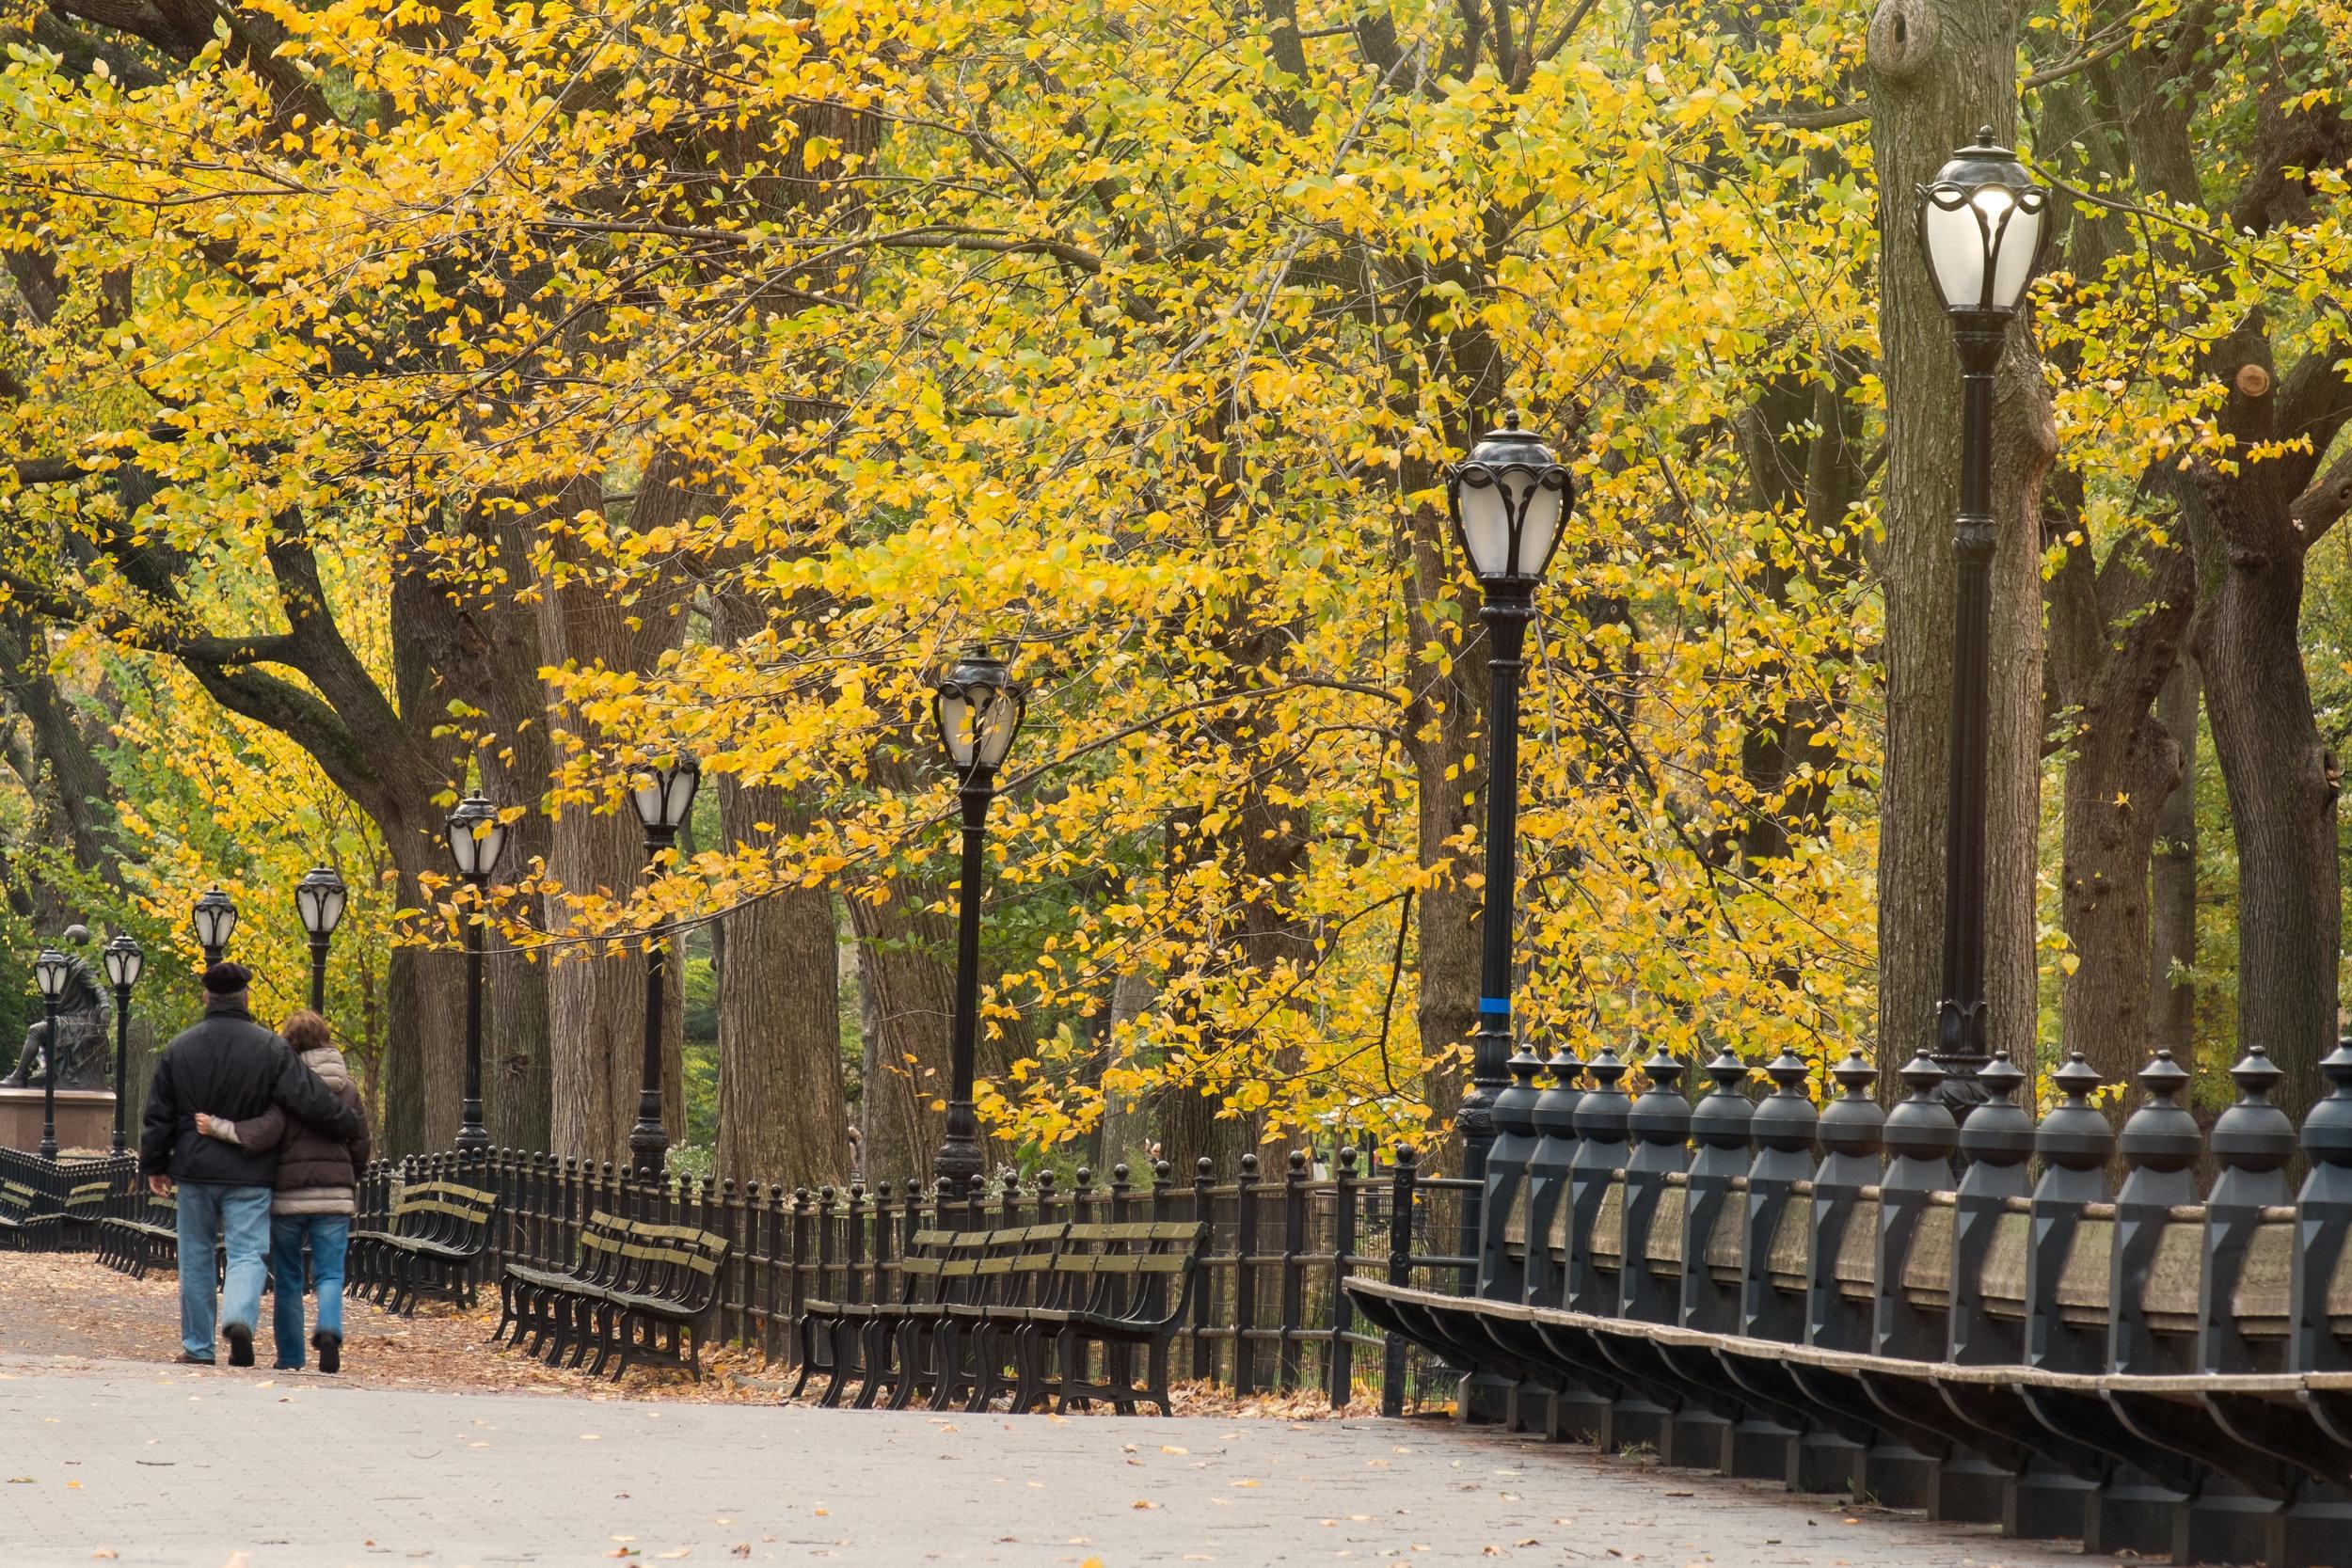 Central Park, New York. 2014.